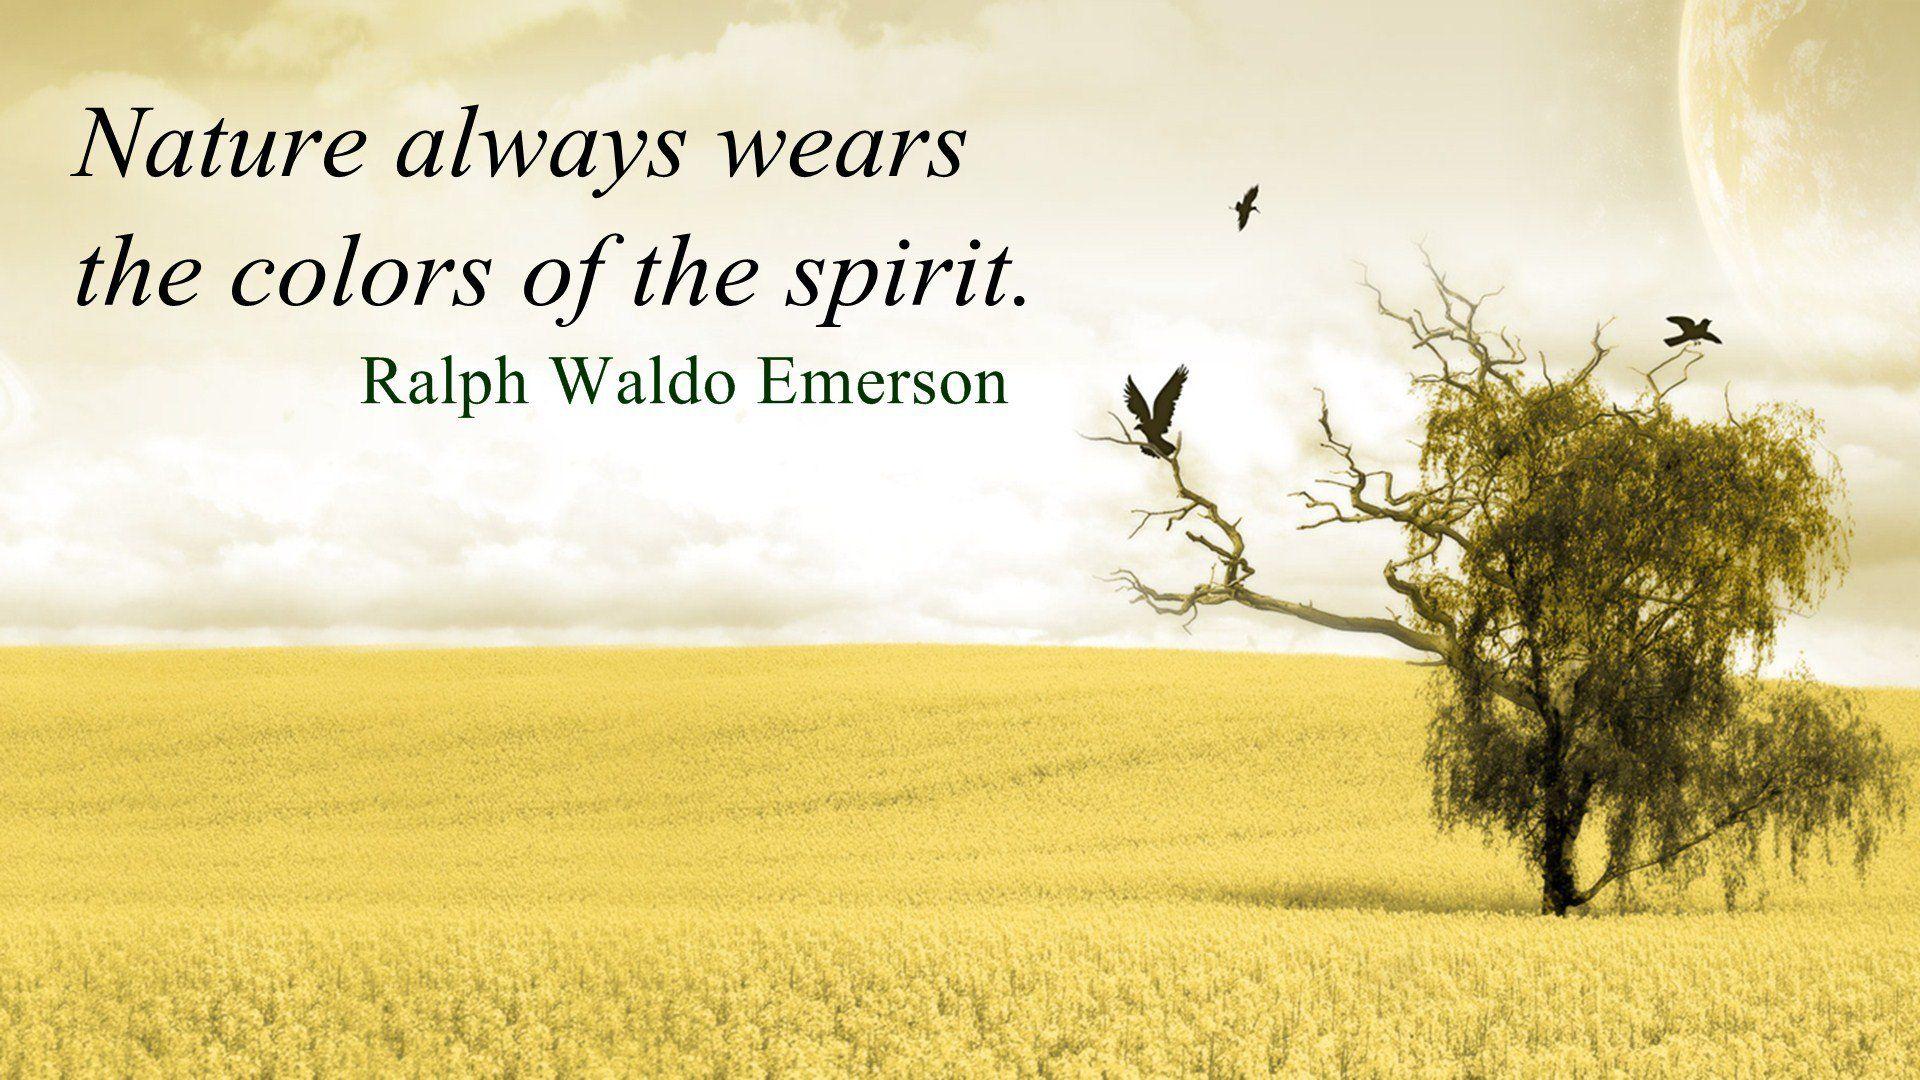 """Nature always wears the colors of the spirit"" - Ralph Waldo Emerson #nature #quotes #naturequotes #naturelovers #natureisbeautiful"